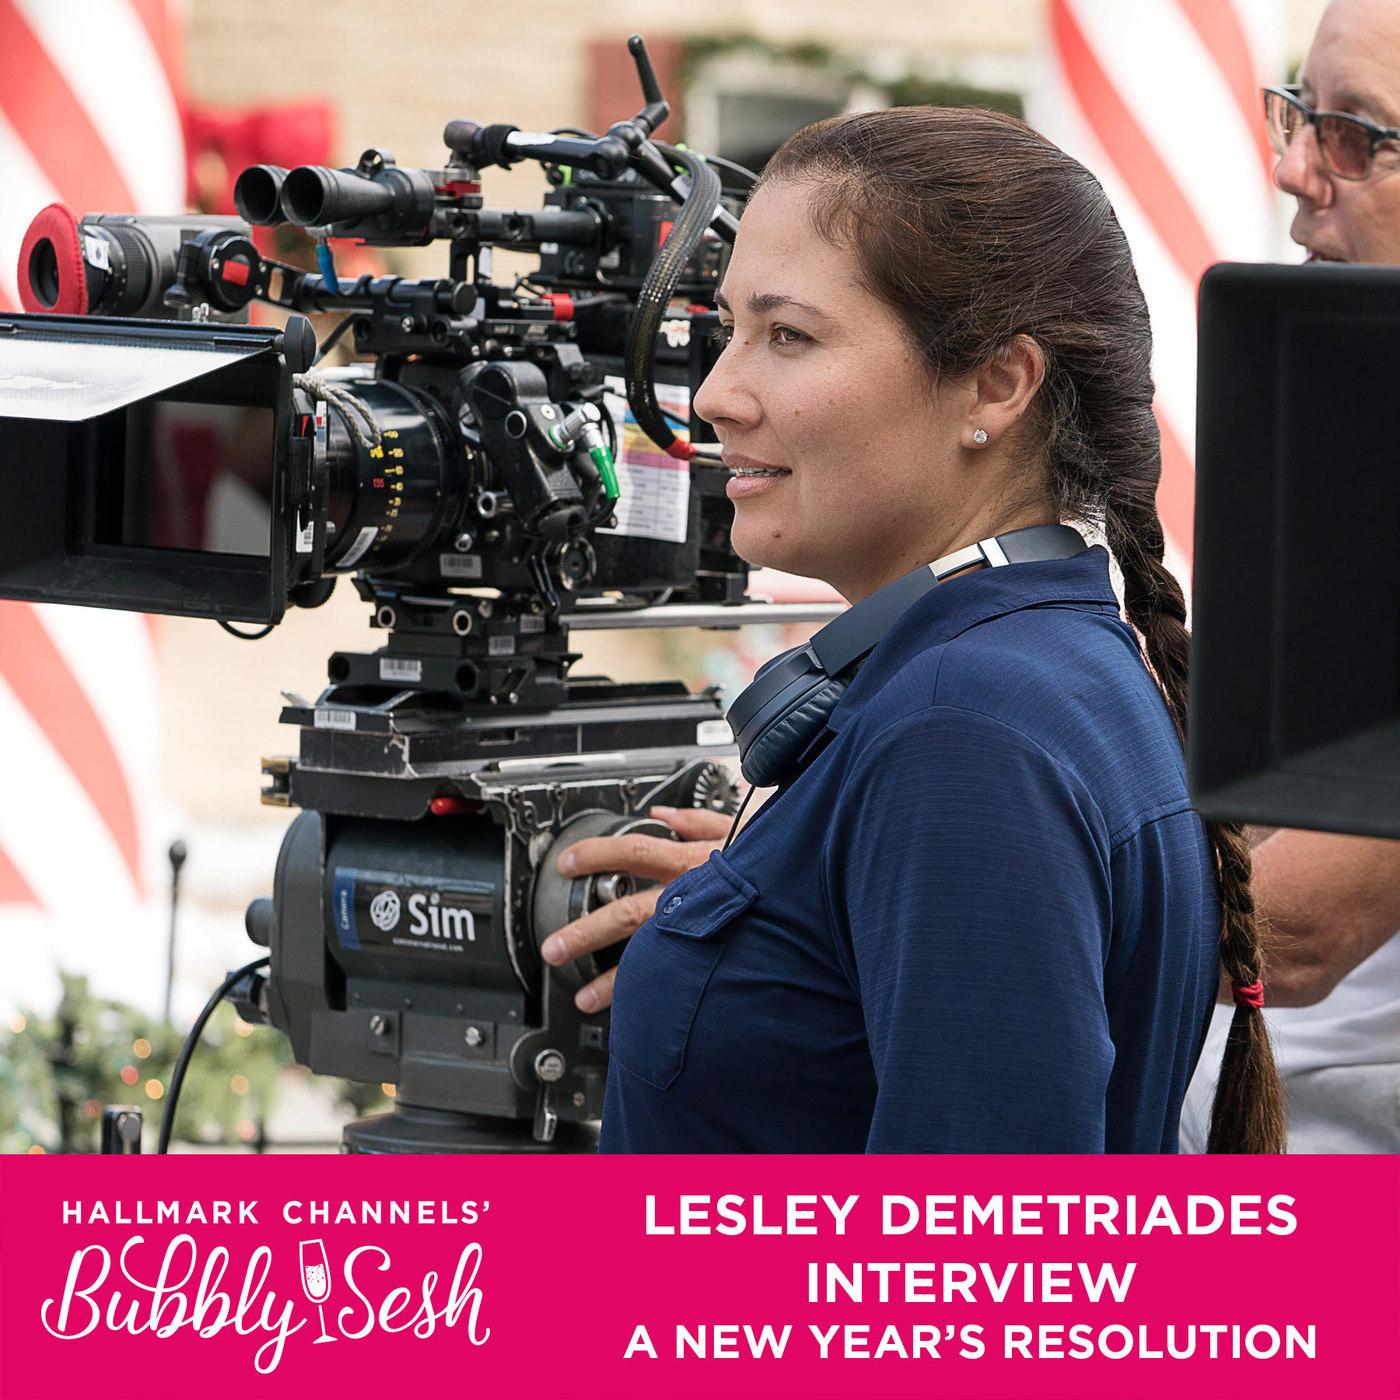 Lesley Demetriades Interview